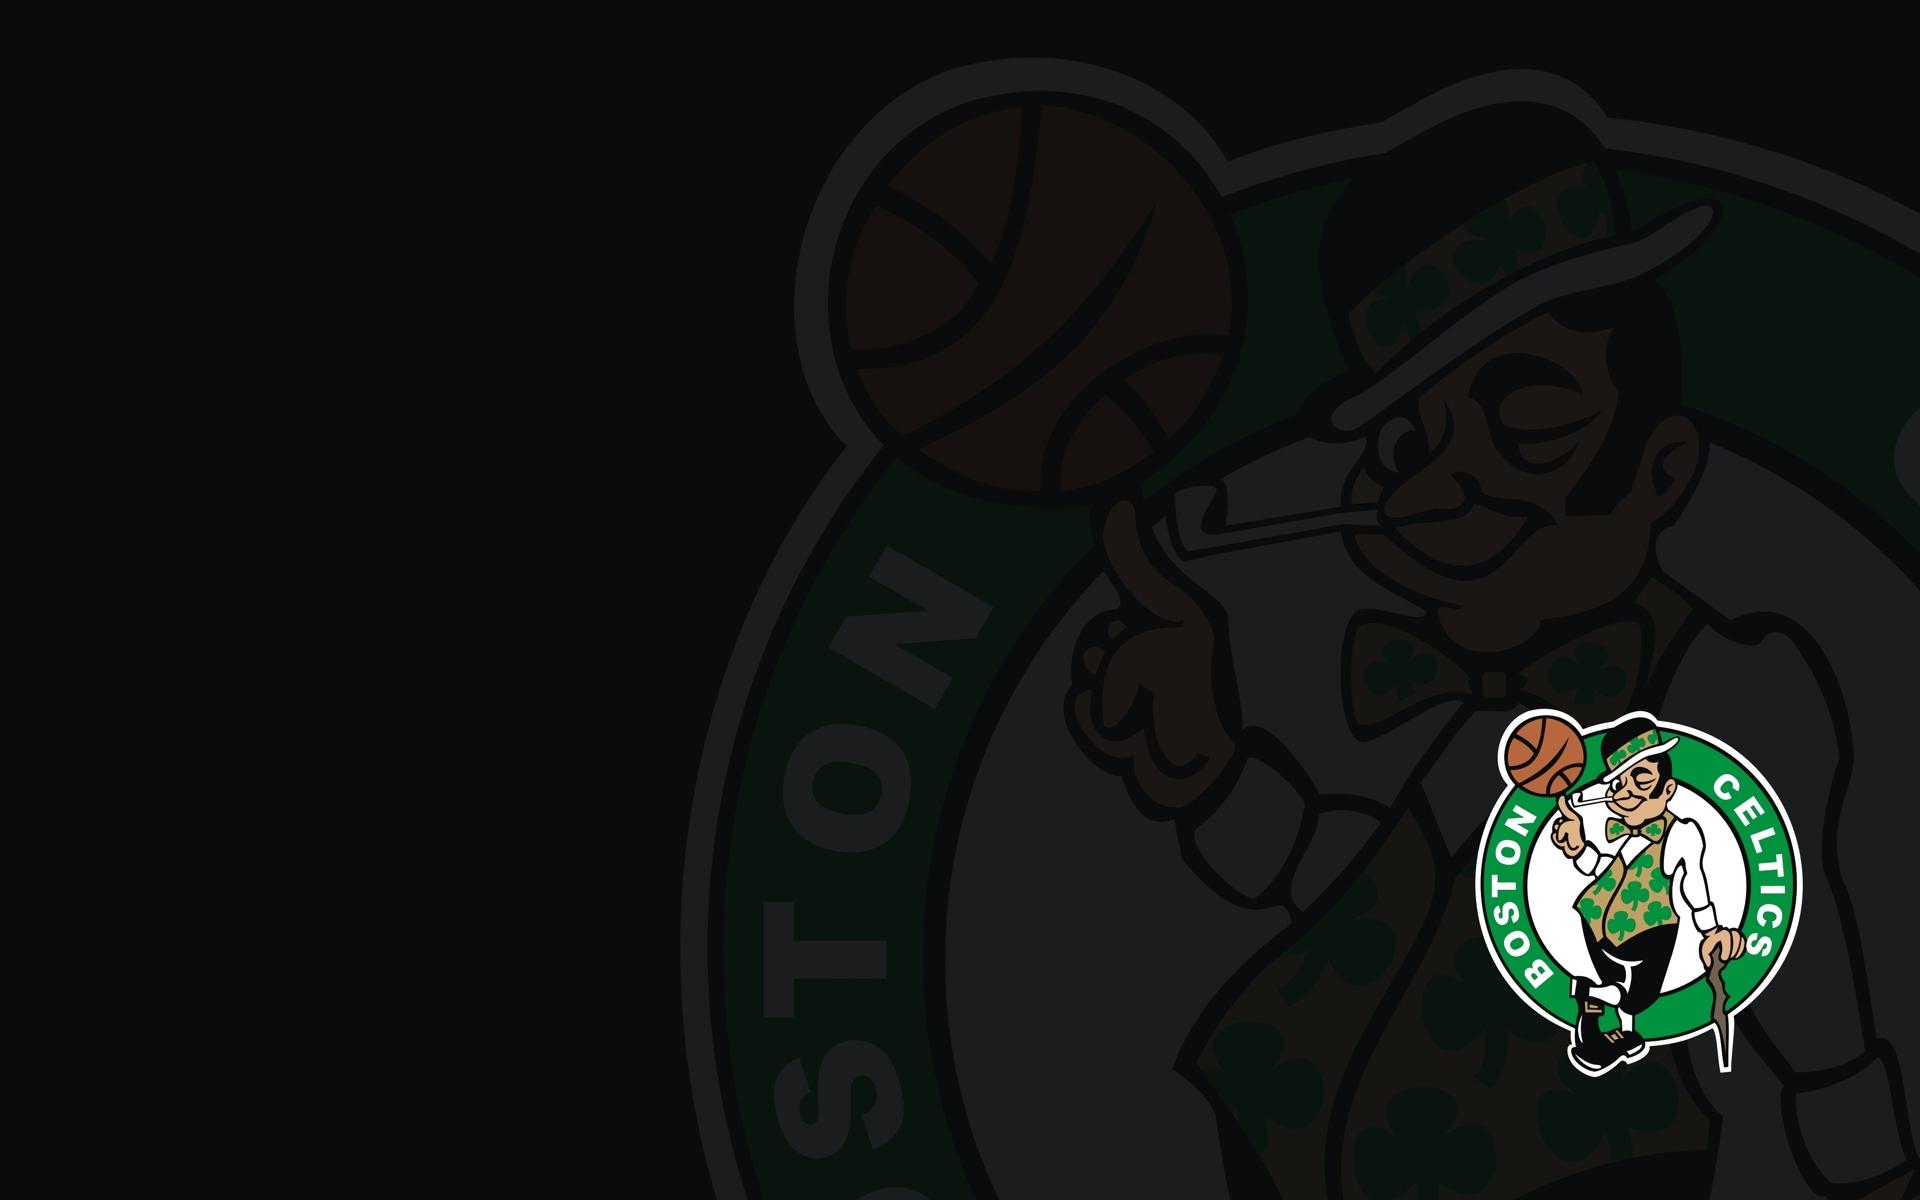 Free Download The Ultimate Boston Celtics Desktop Wallpaper